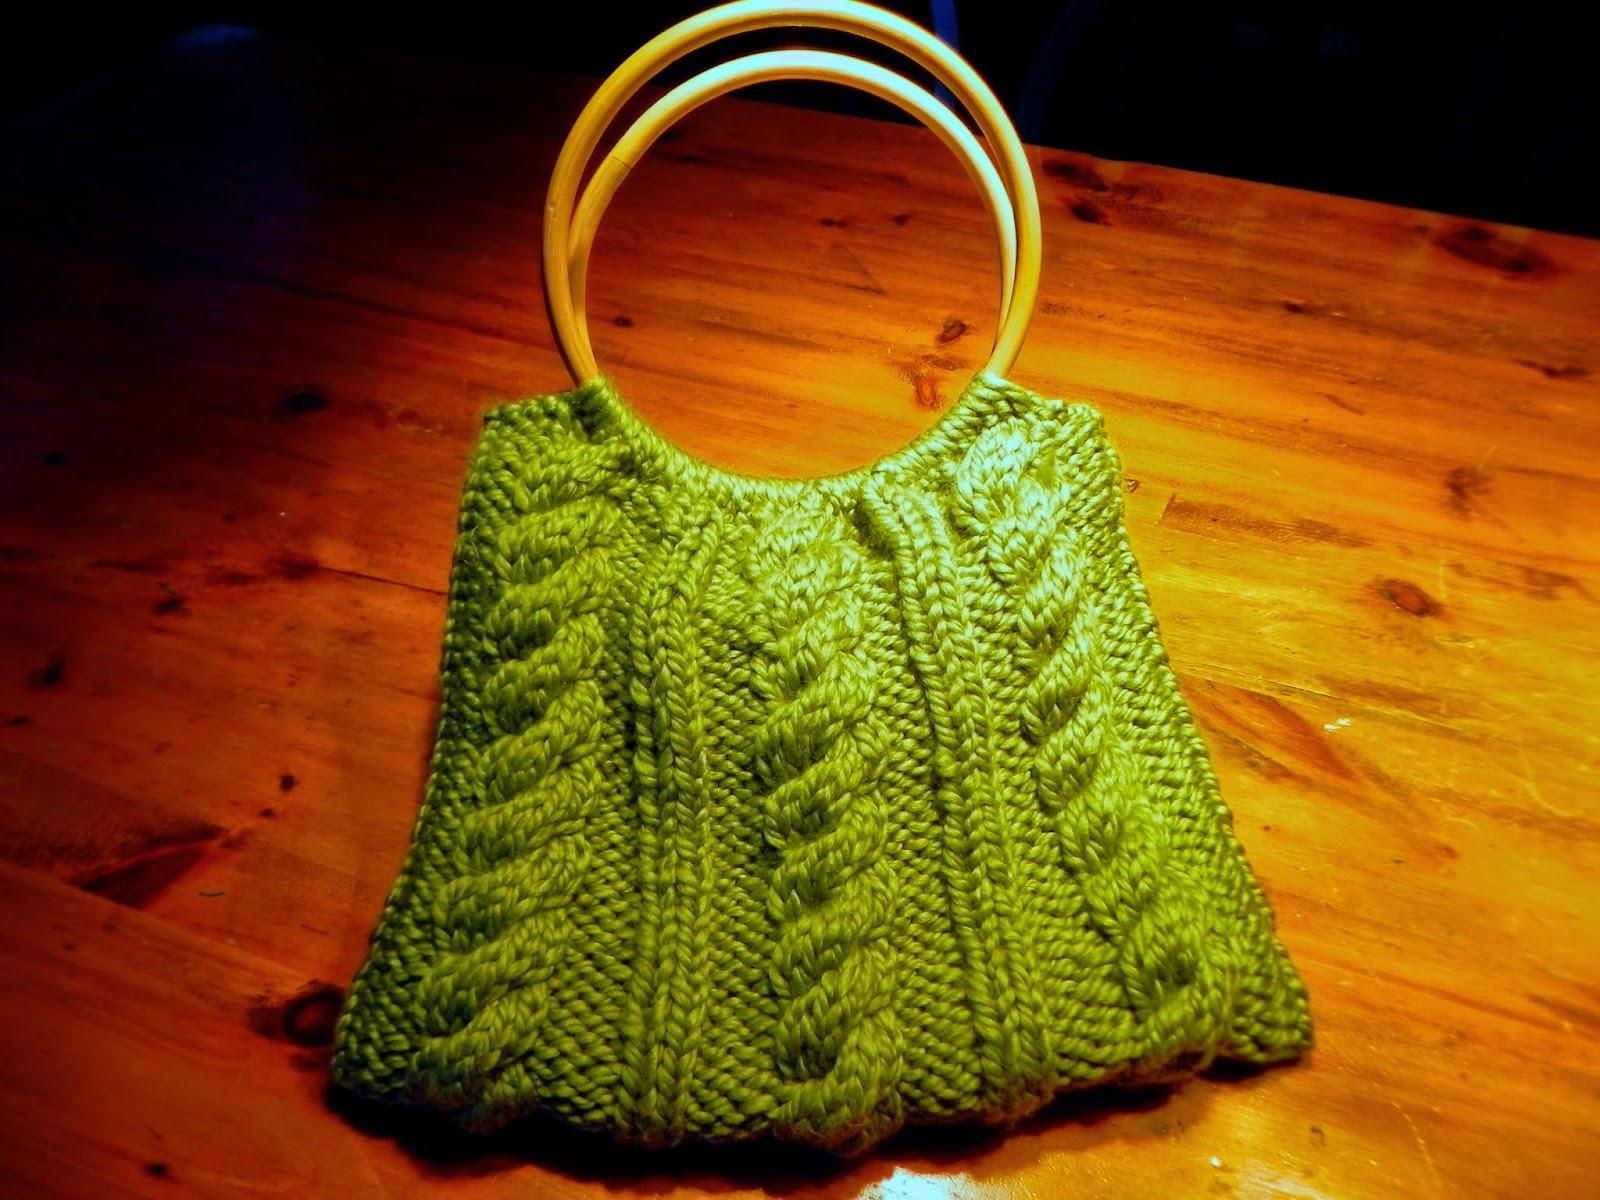 Sewing Stash Challenge (and now my knitting stash too